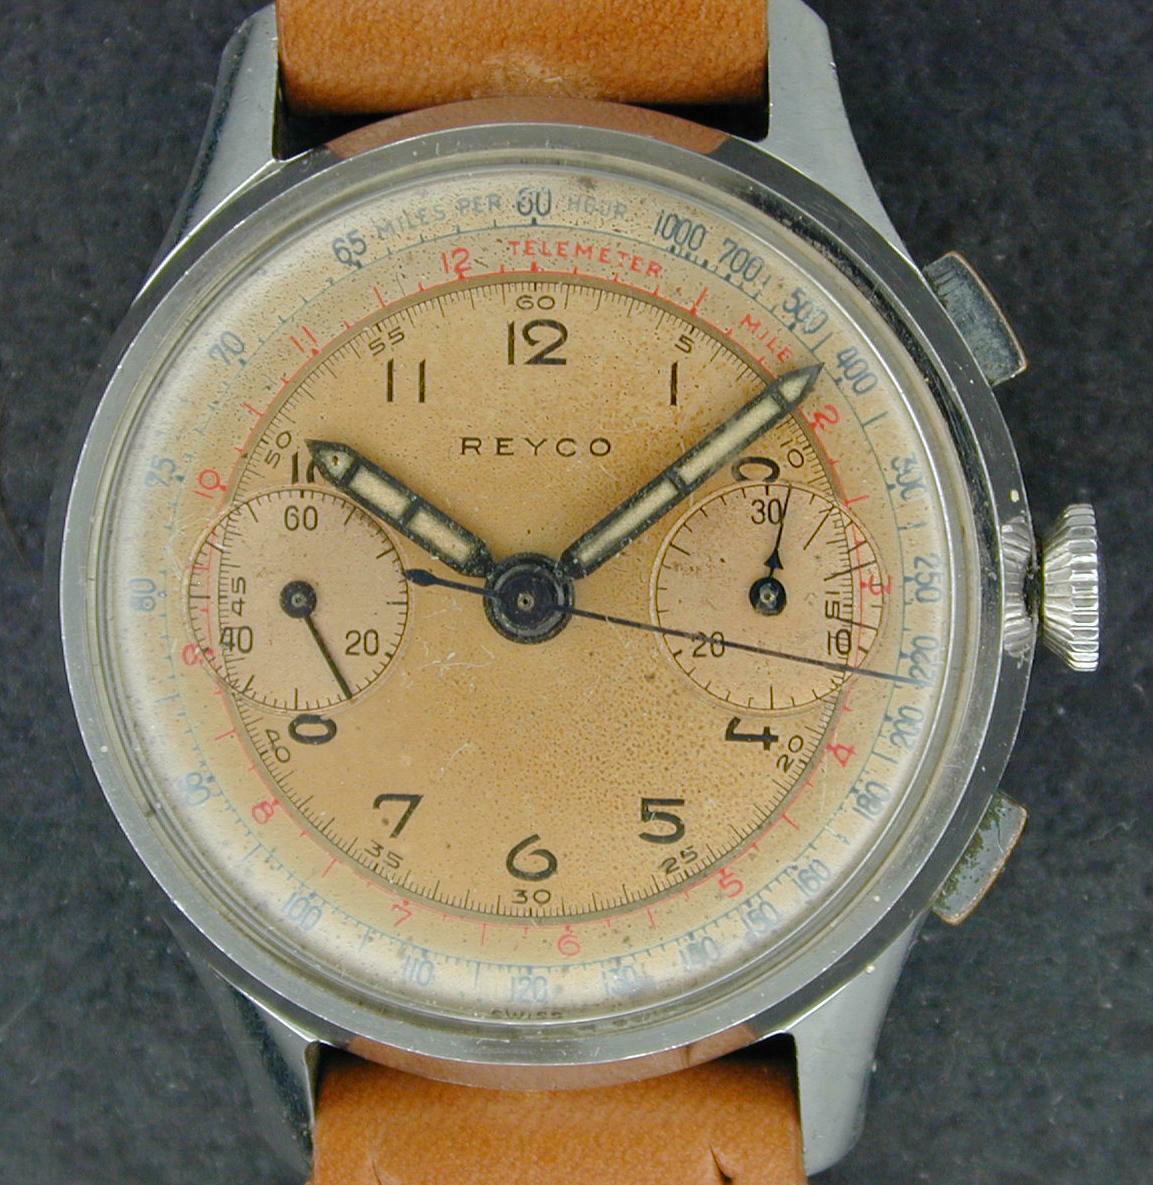 Reyco Chronograph Valjjoux 22